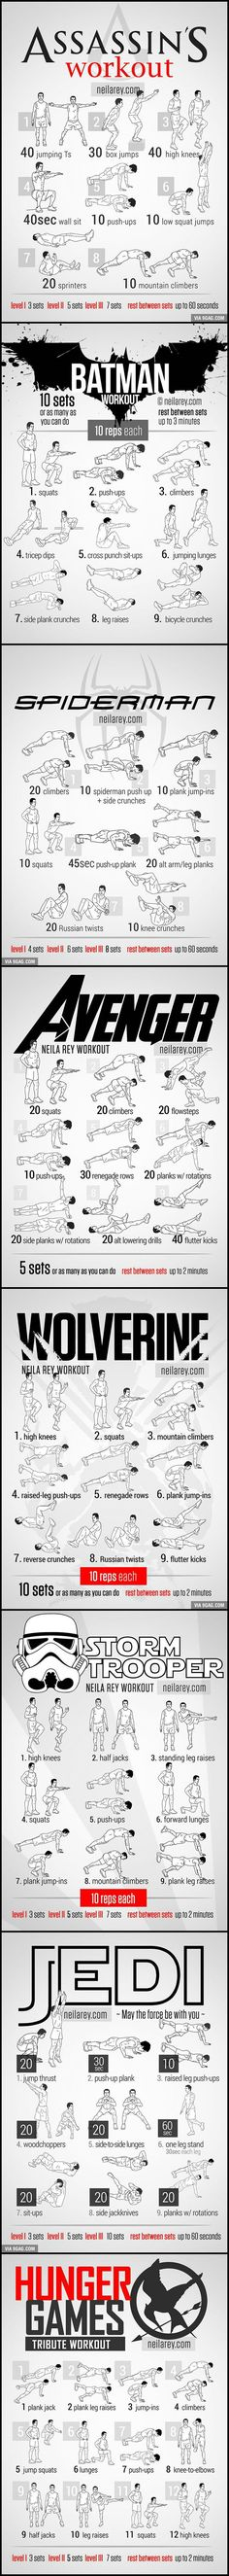 Themed Workout for Assassin, Batman, Spiderman, Avenger, Wolverine, Star Wars, Hunger Games...